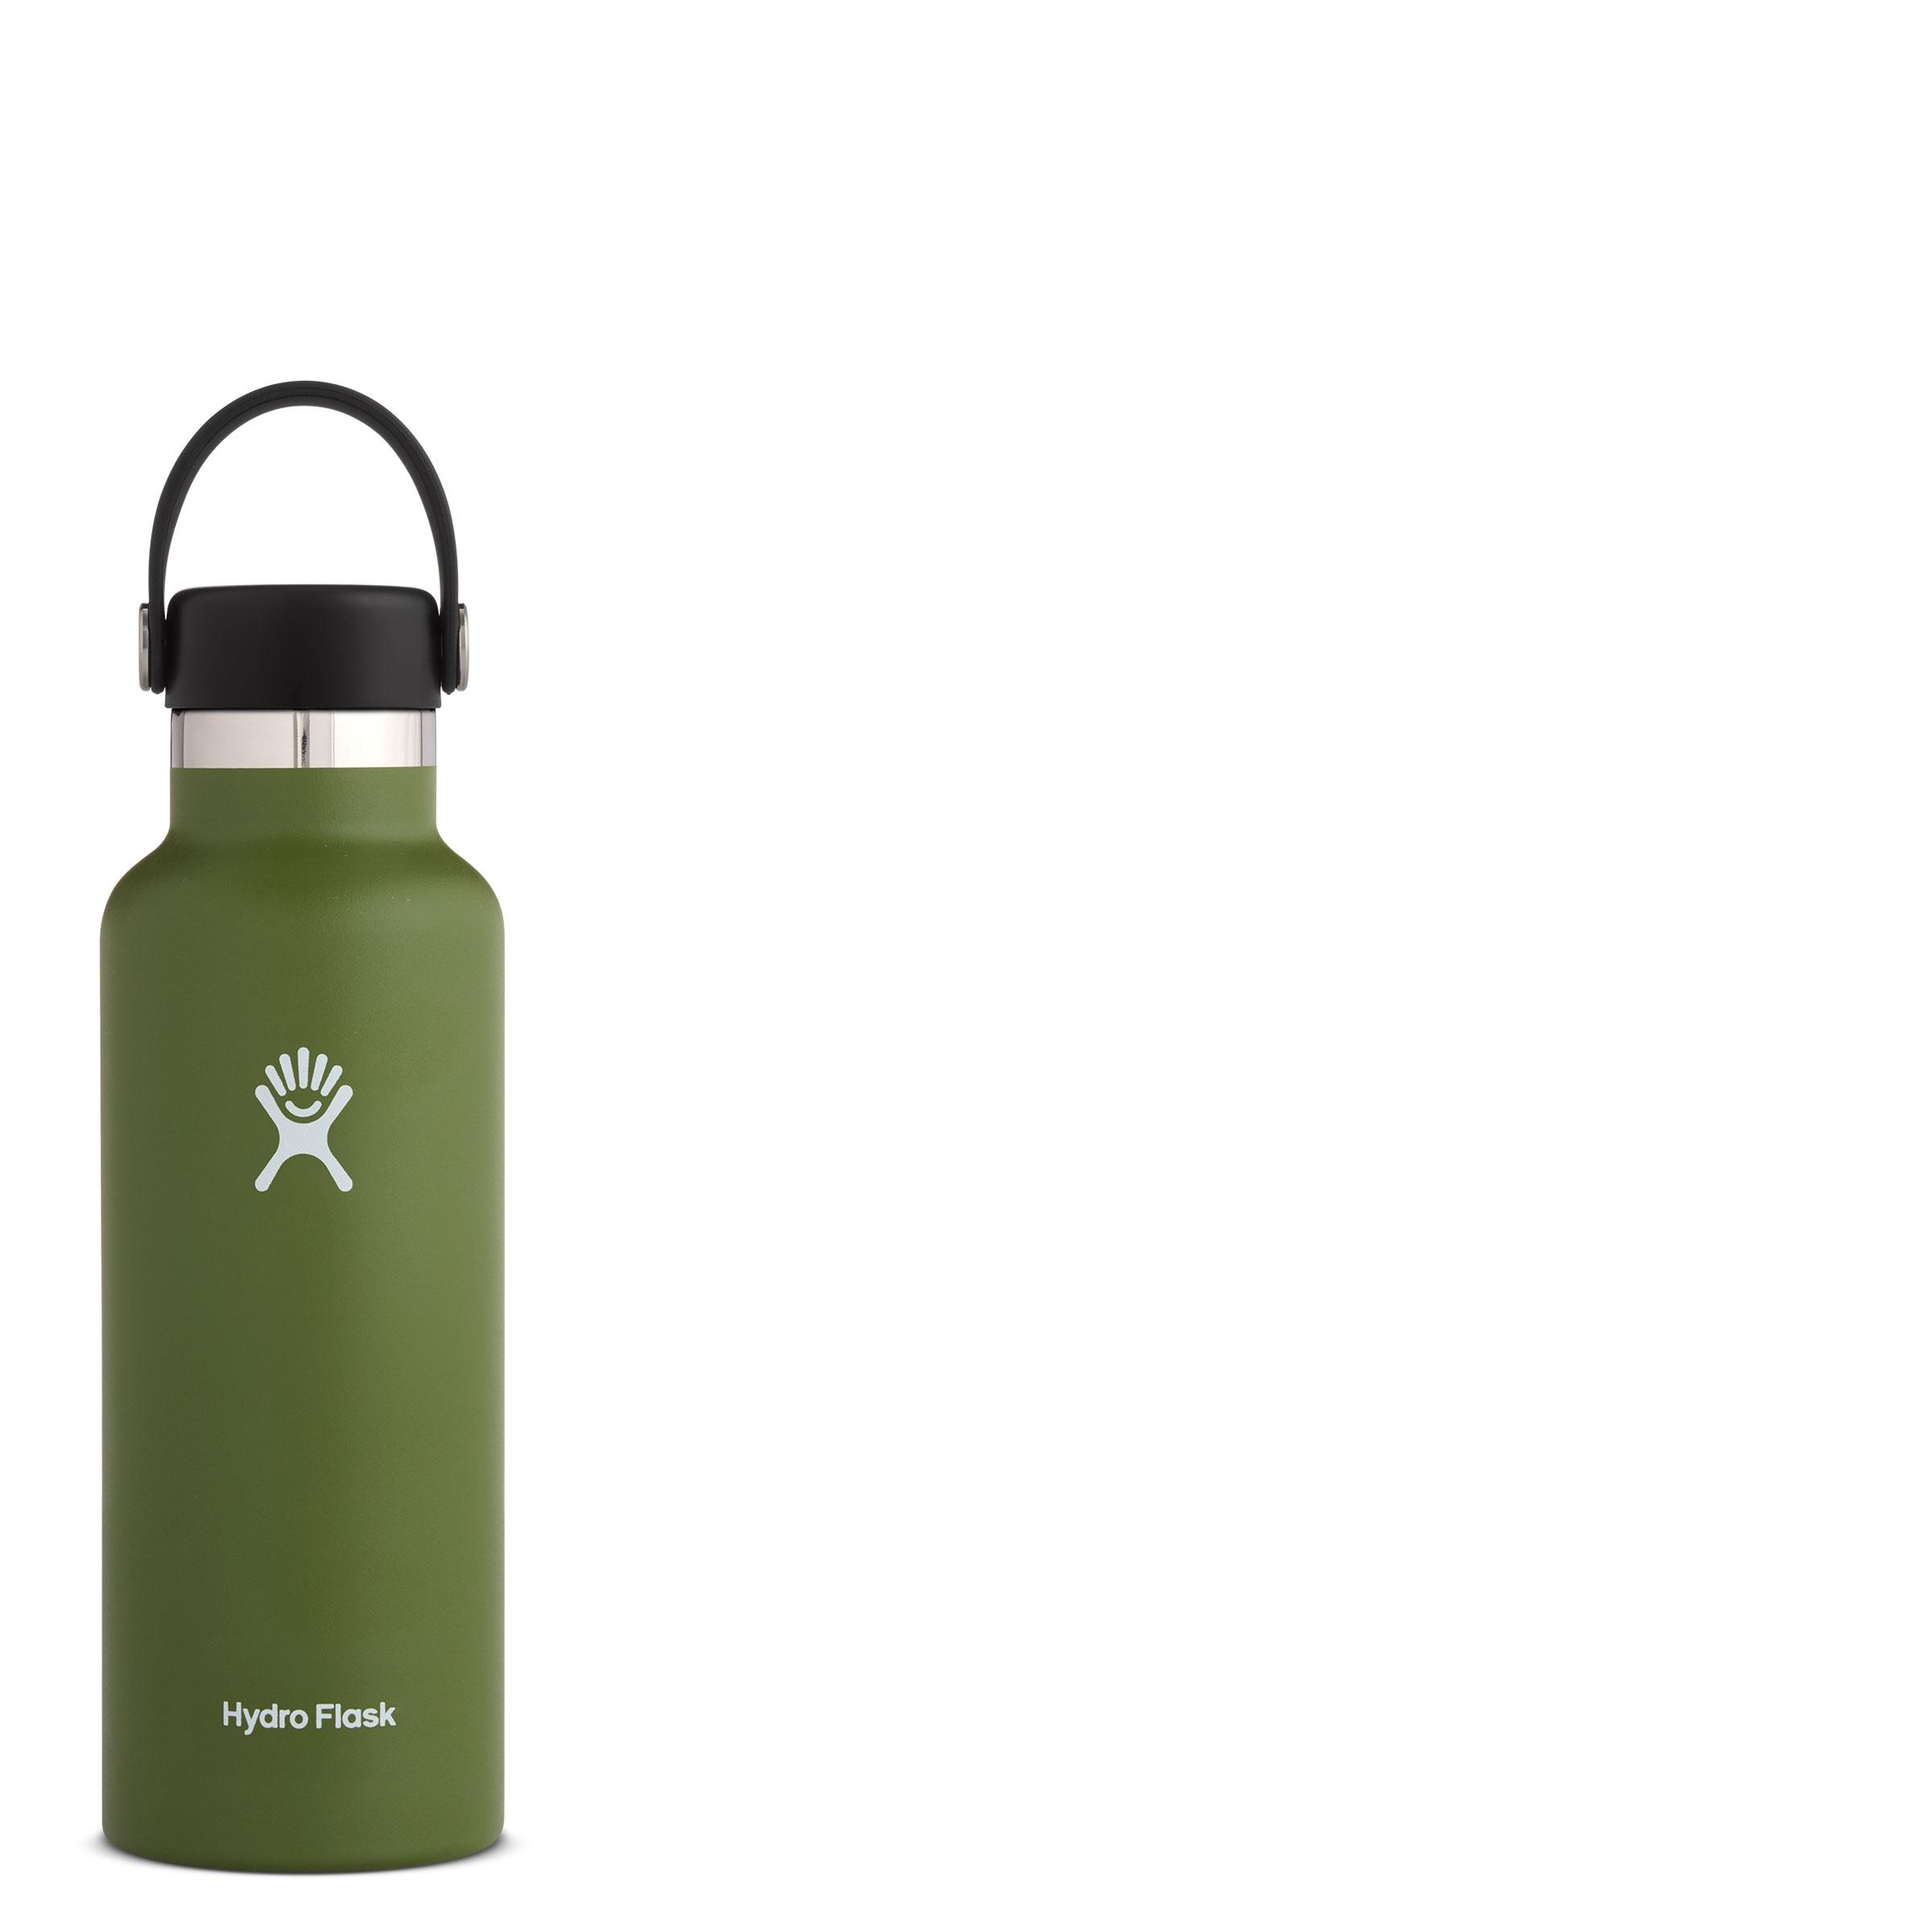 Hydroflask 18 oz standard mouth